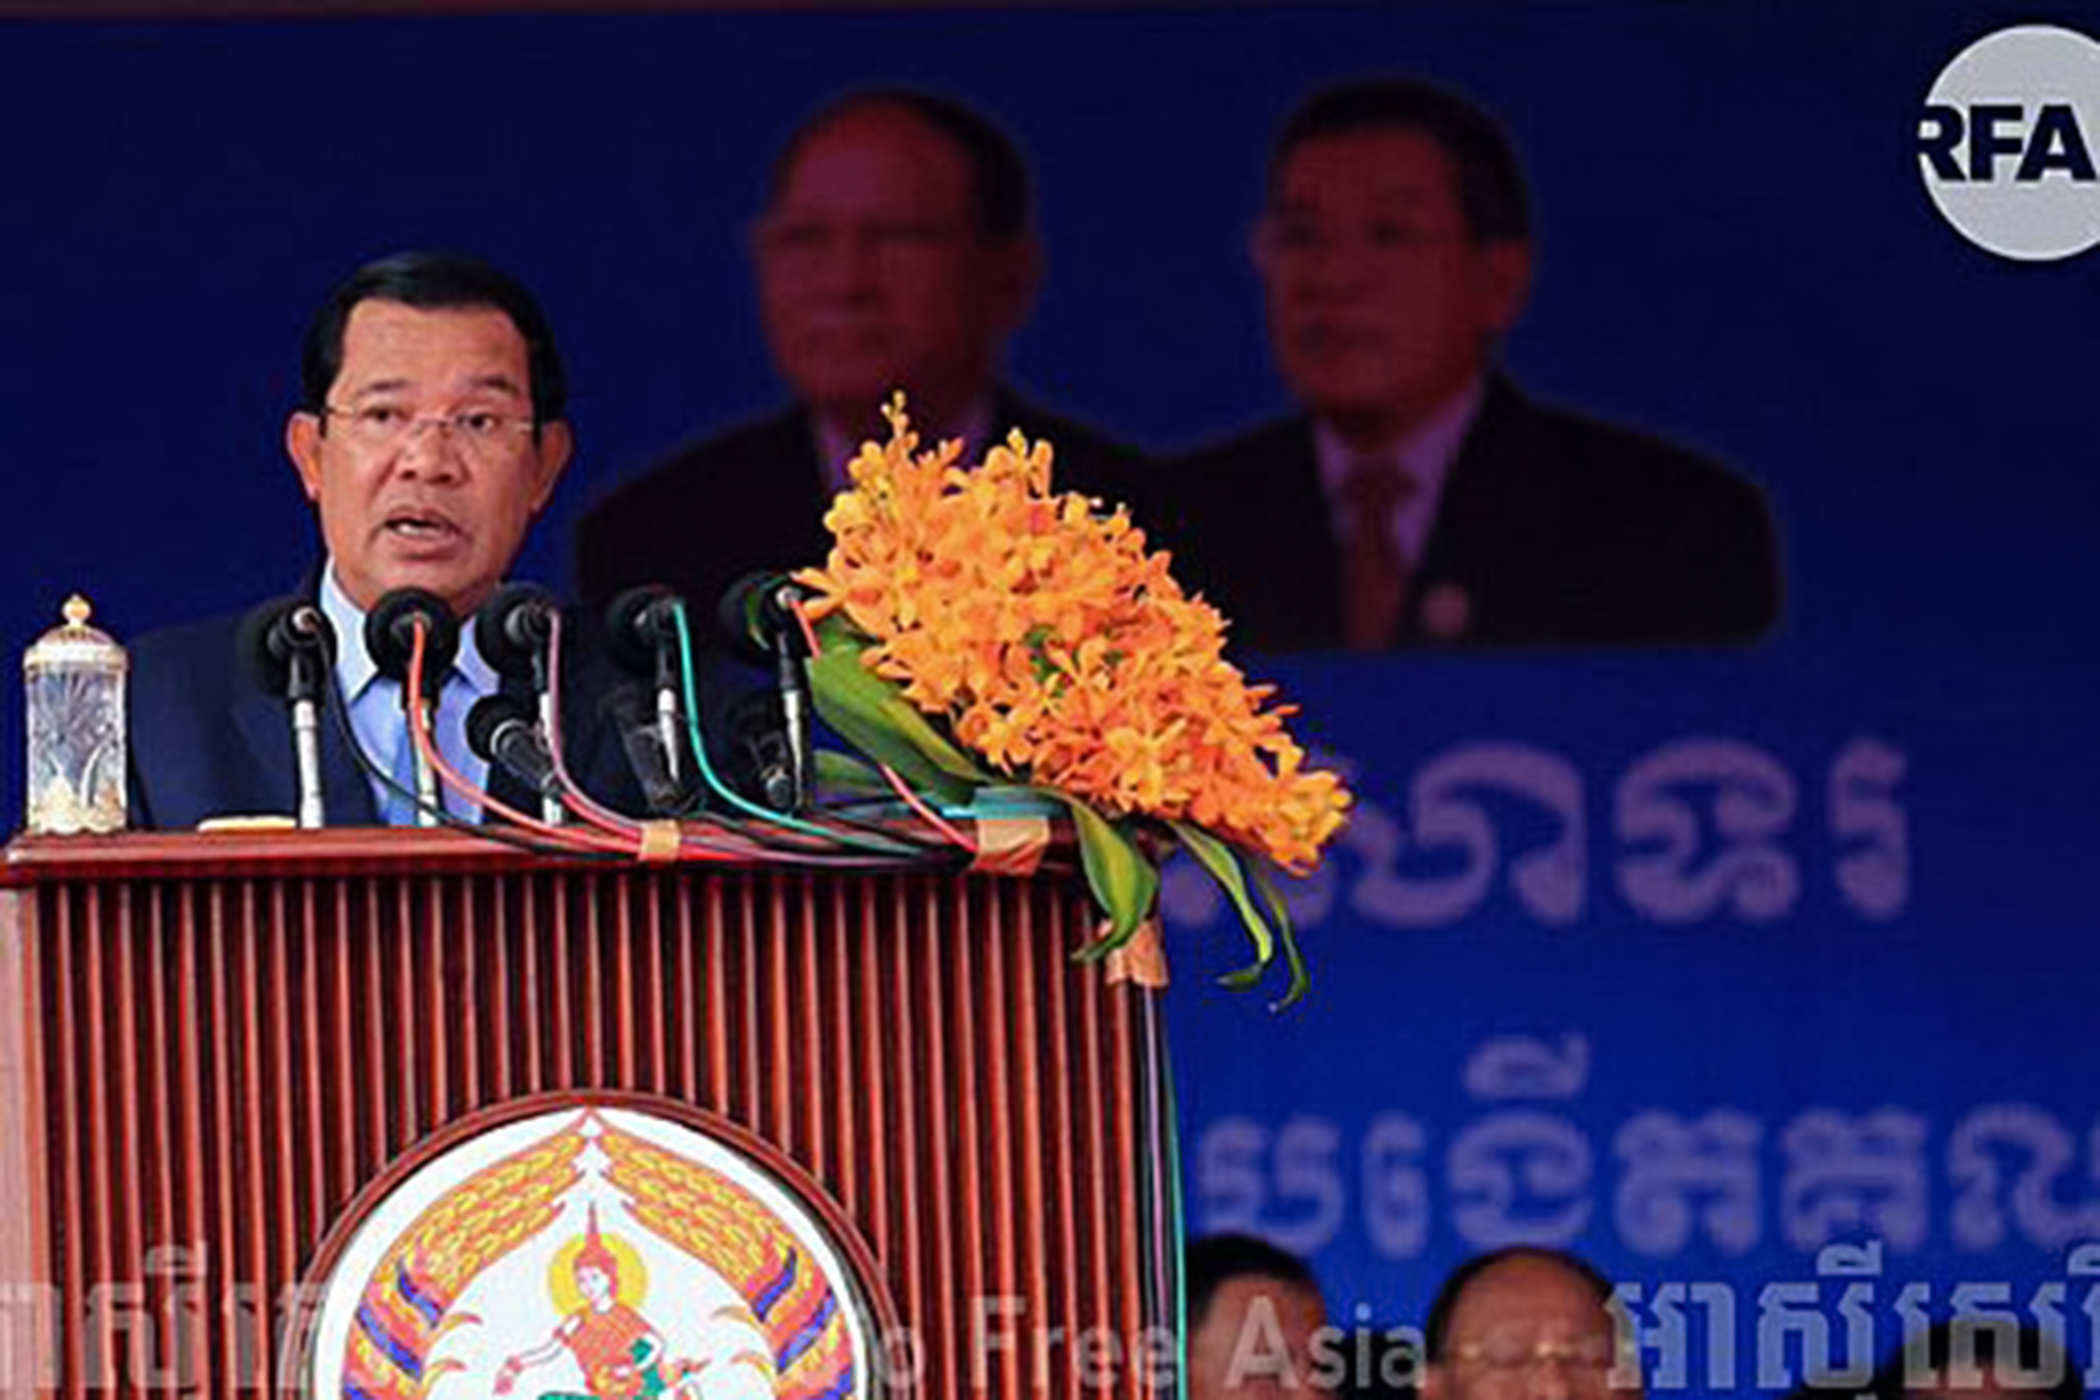 CEO statement on the closing of RFA's Phnom Penh Bureau